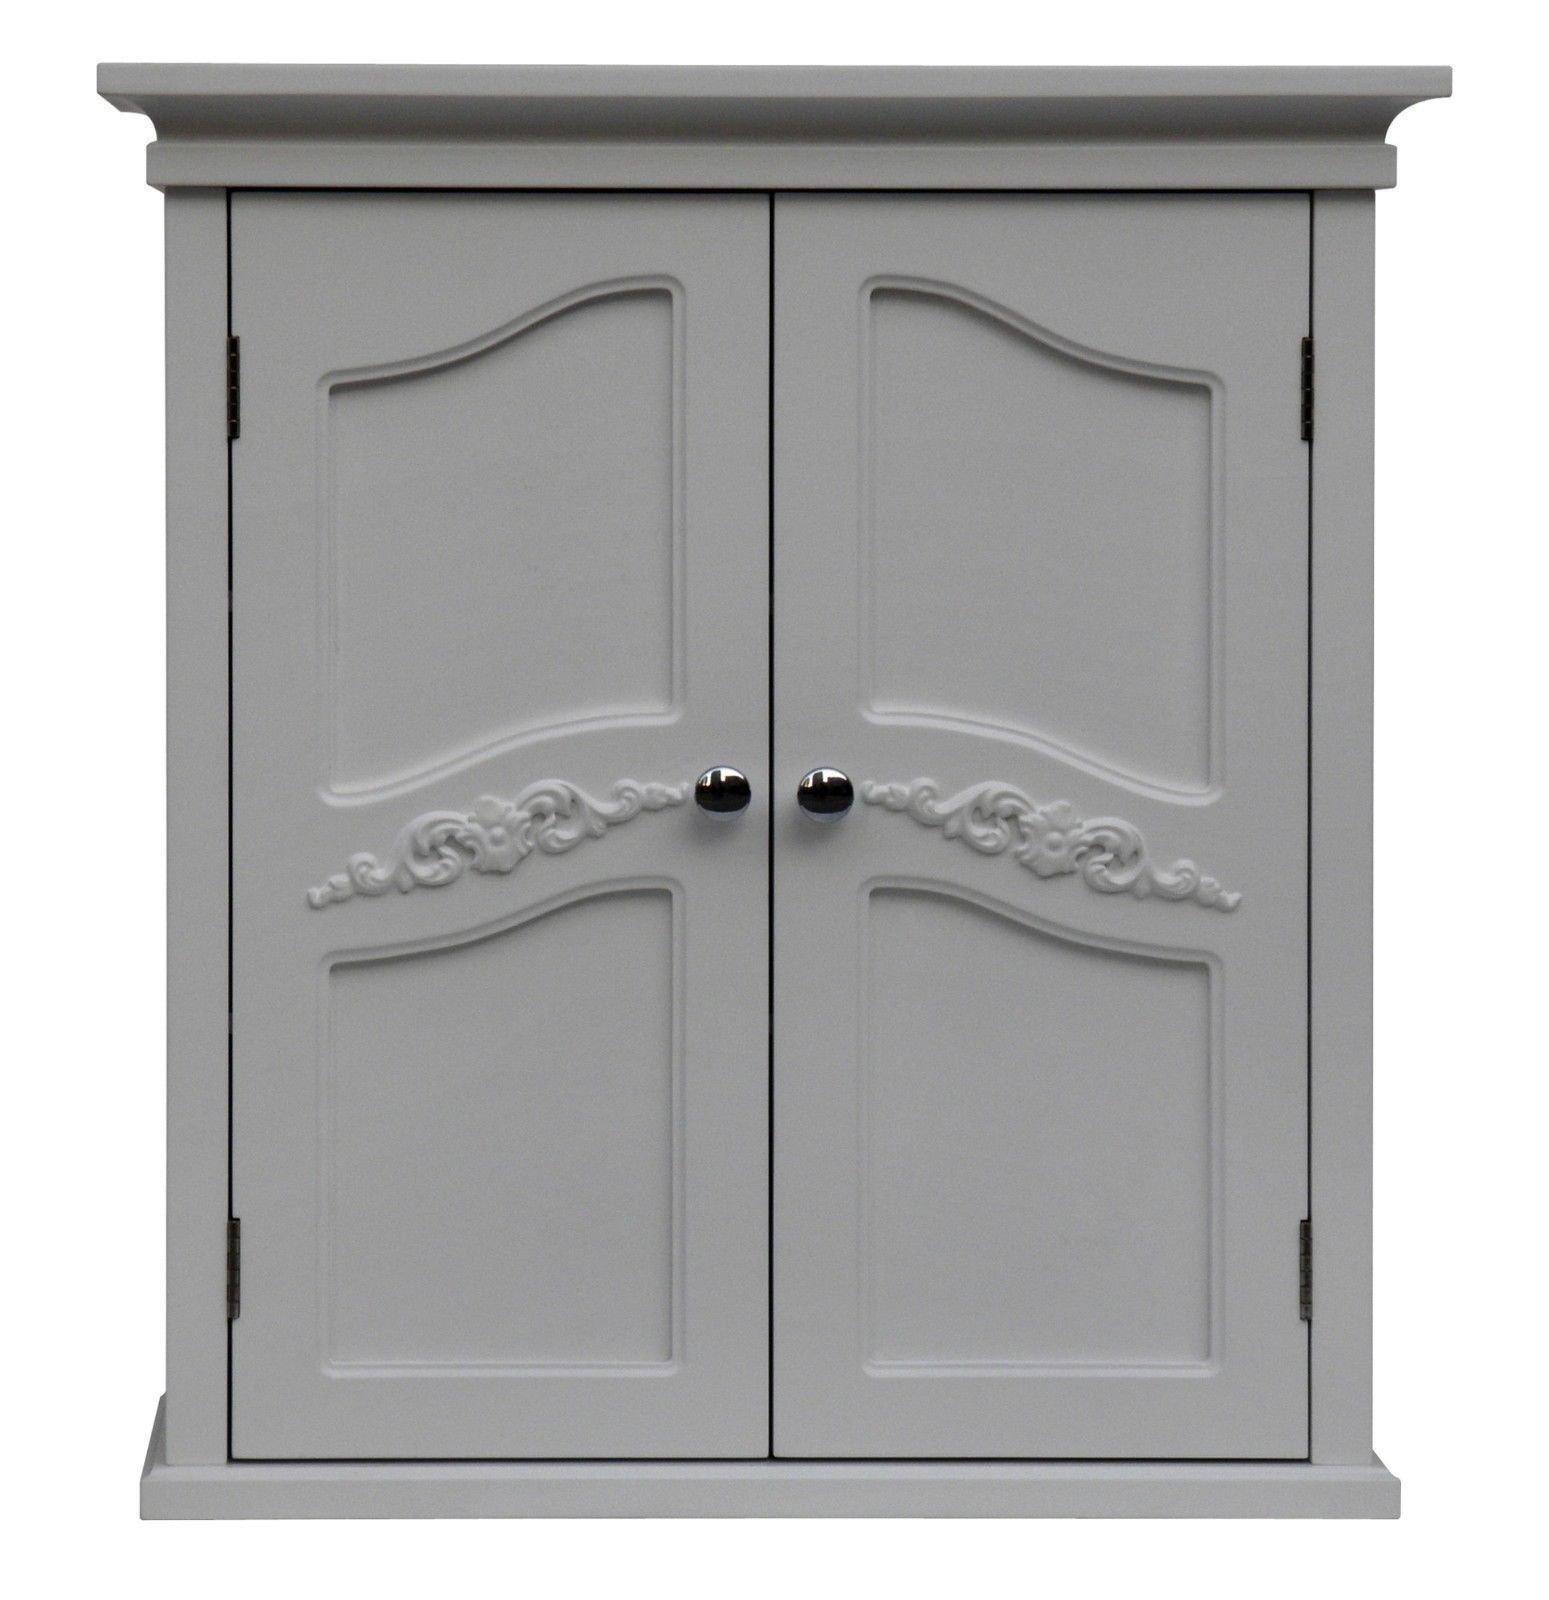 NEW White Bath Wall Medicine Cabinet Tank Topper Storage Shelf Wooden